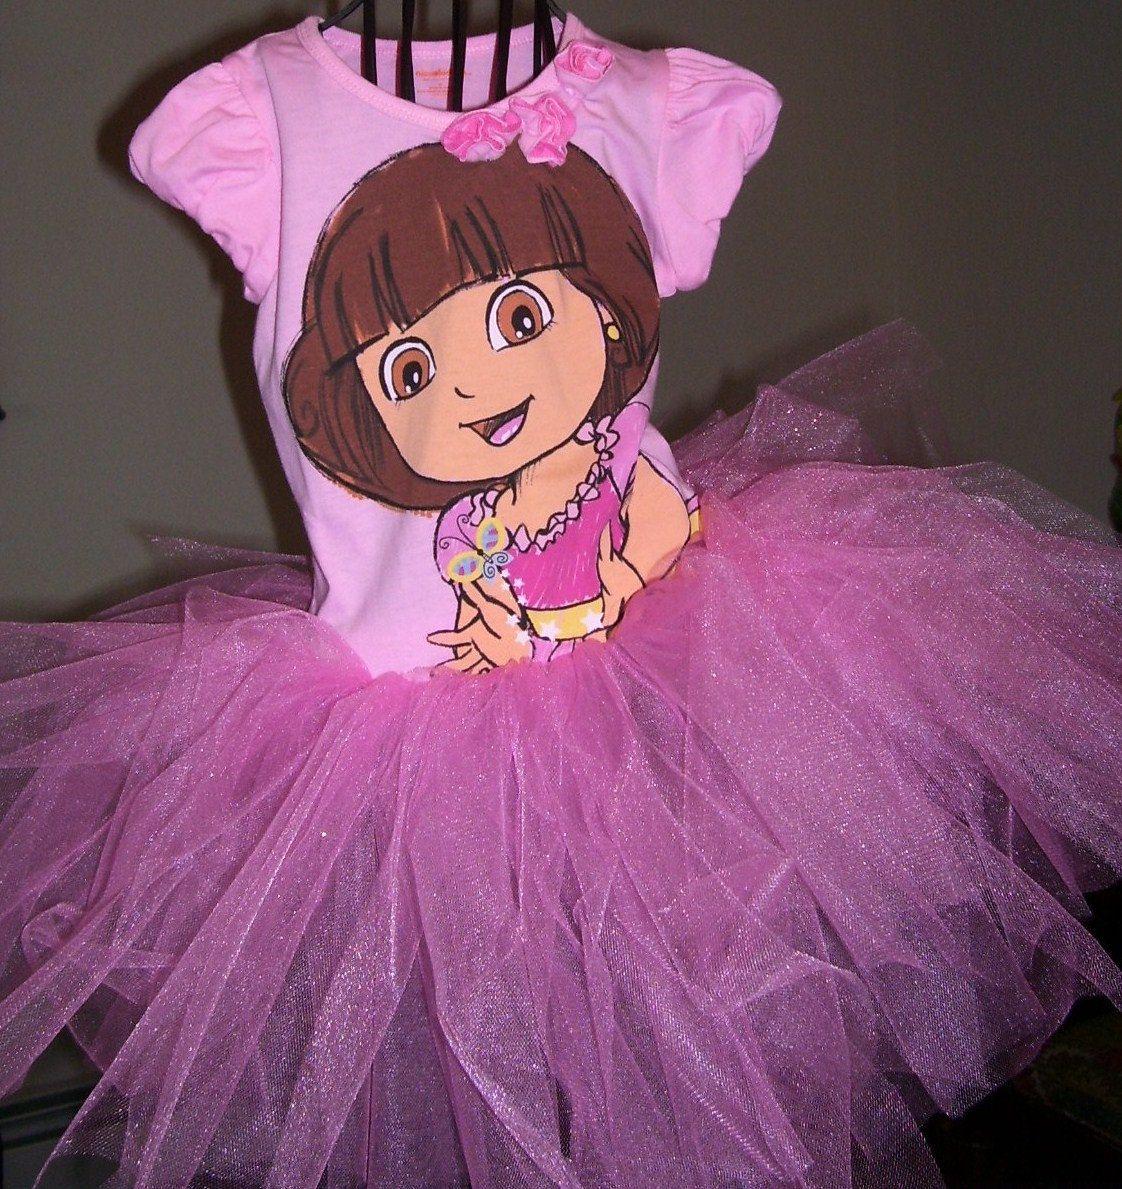 Dora the Explorer pink tutu dress...size 4t .ready to ship. $25.99 ...